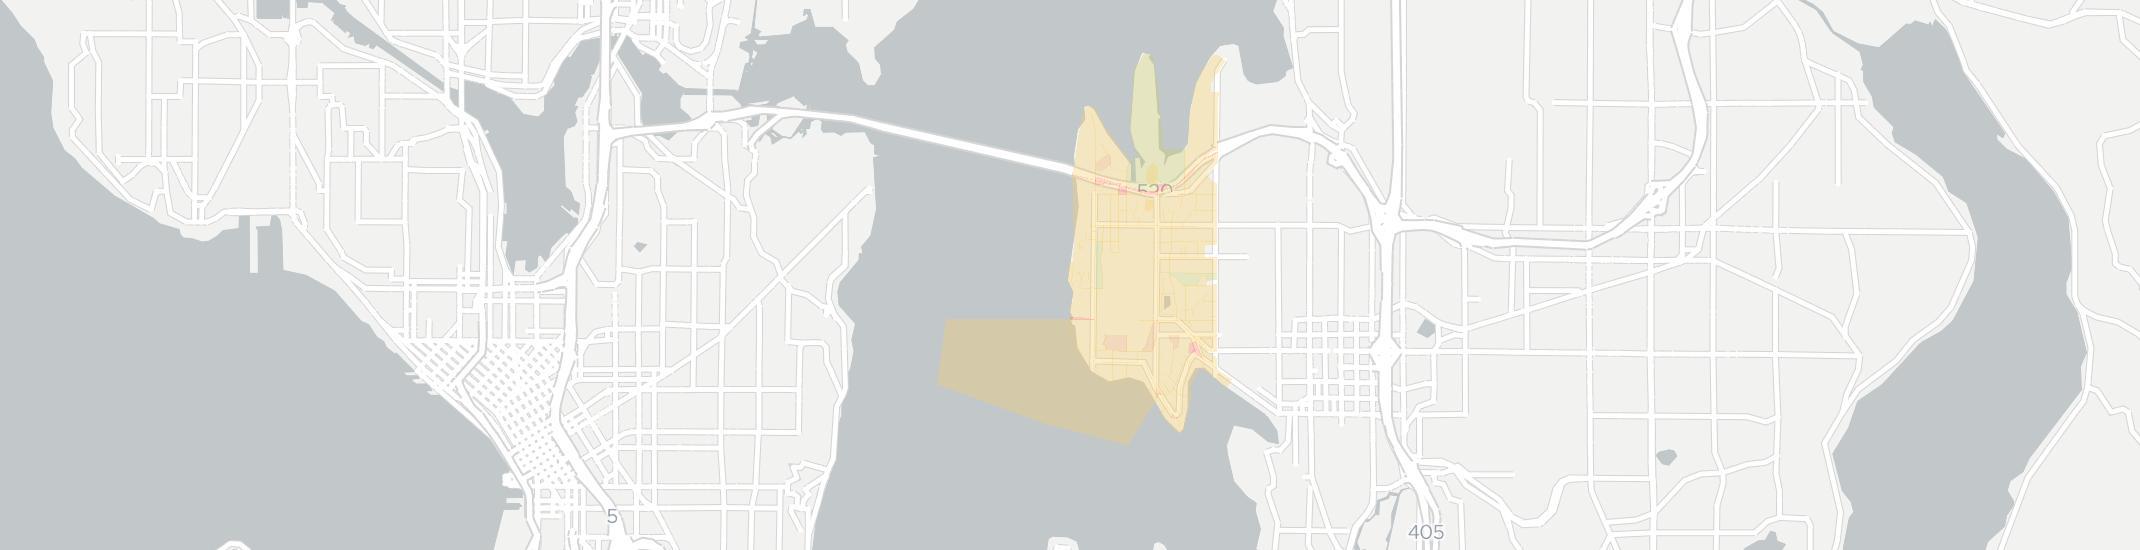 Medina Washington Map.Internet Providers In Medina Wa Compare 13 Providers